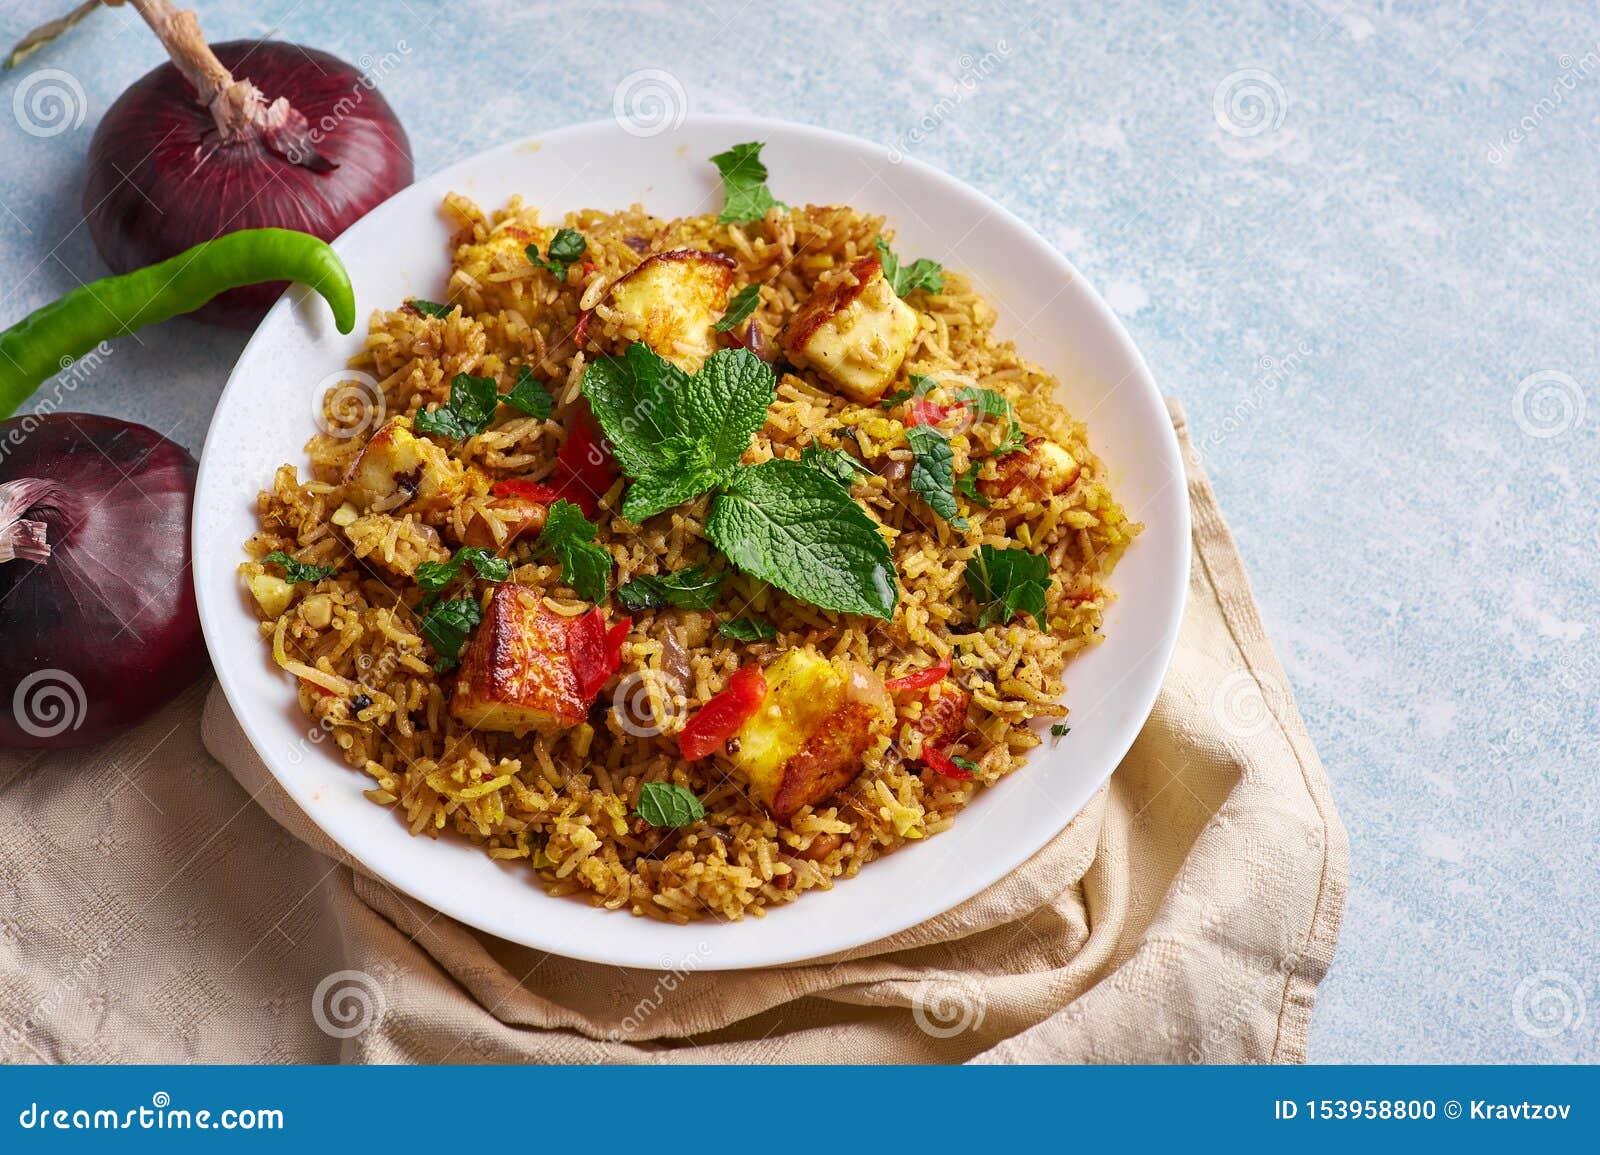 Vegetarian Paneer Biryani At Light Blue Background Stock